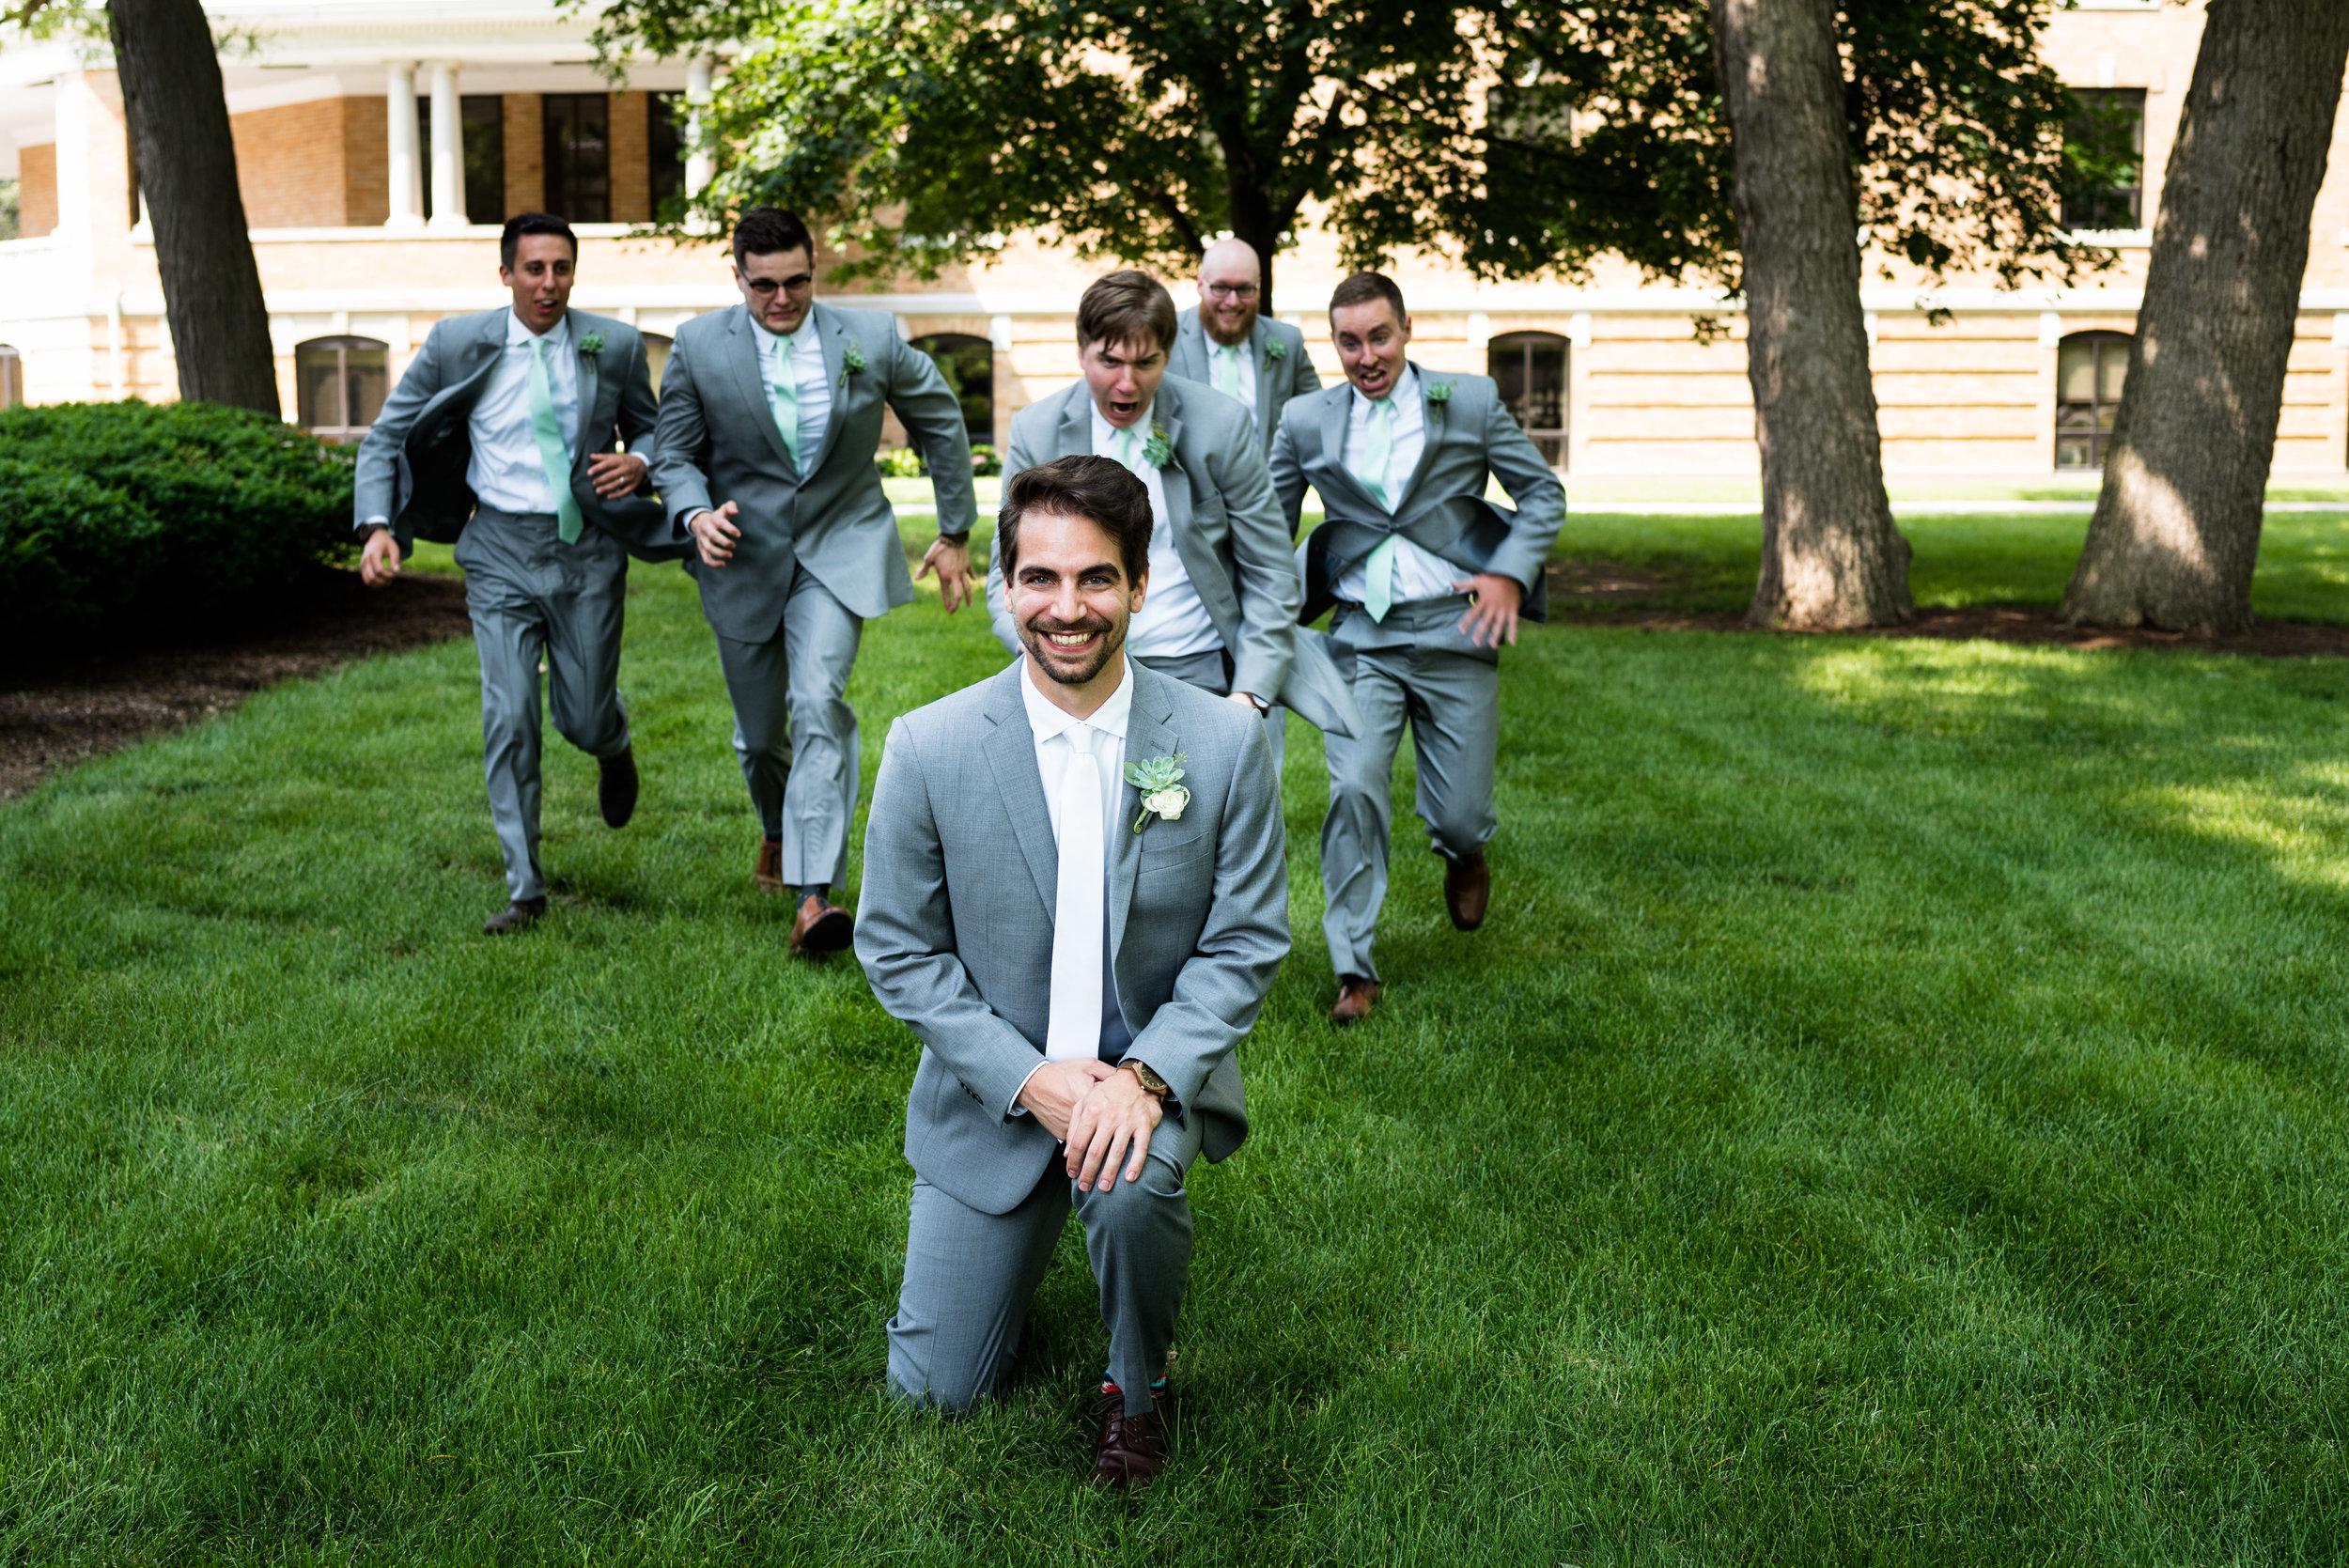 bg ohio wedding photos